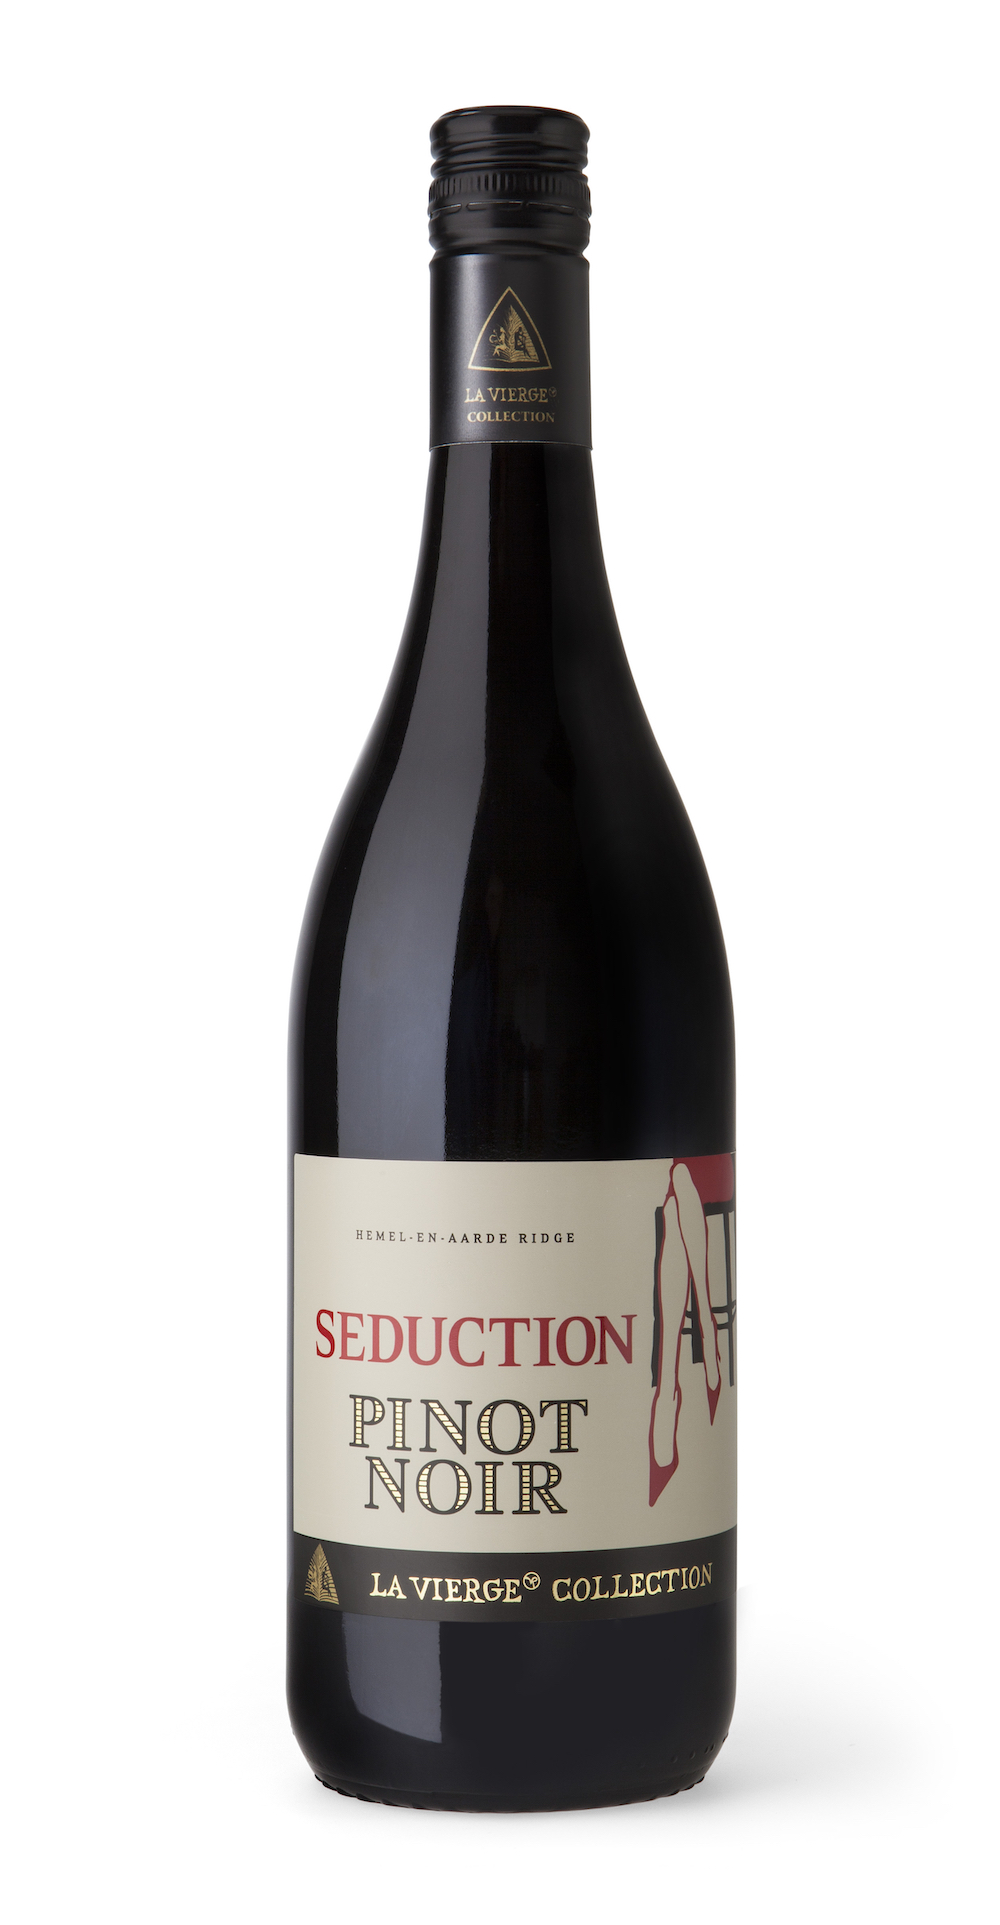 La Vierge - Seduction Pinot Noir Resize